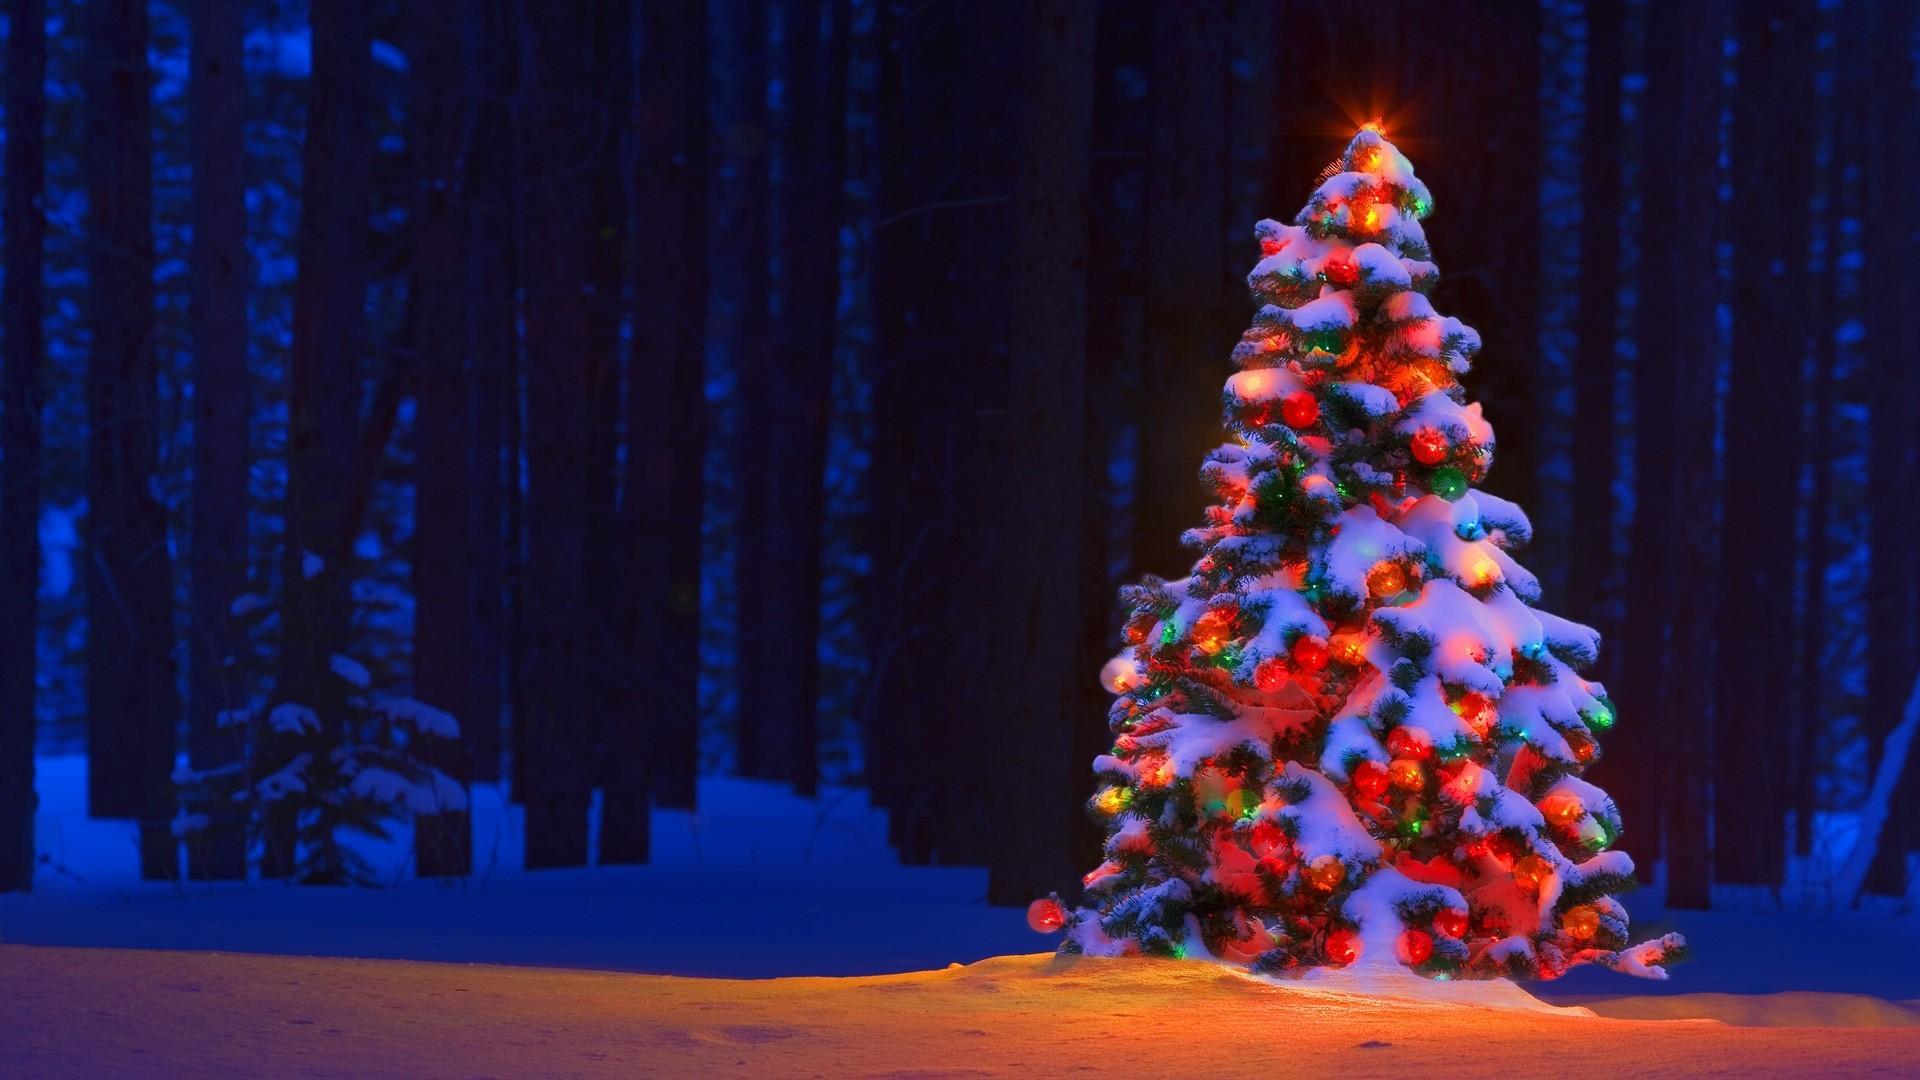 Christmas Lights Tree Desktop Backgrounds